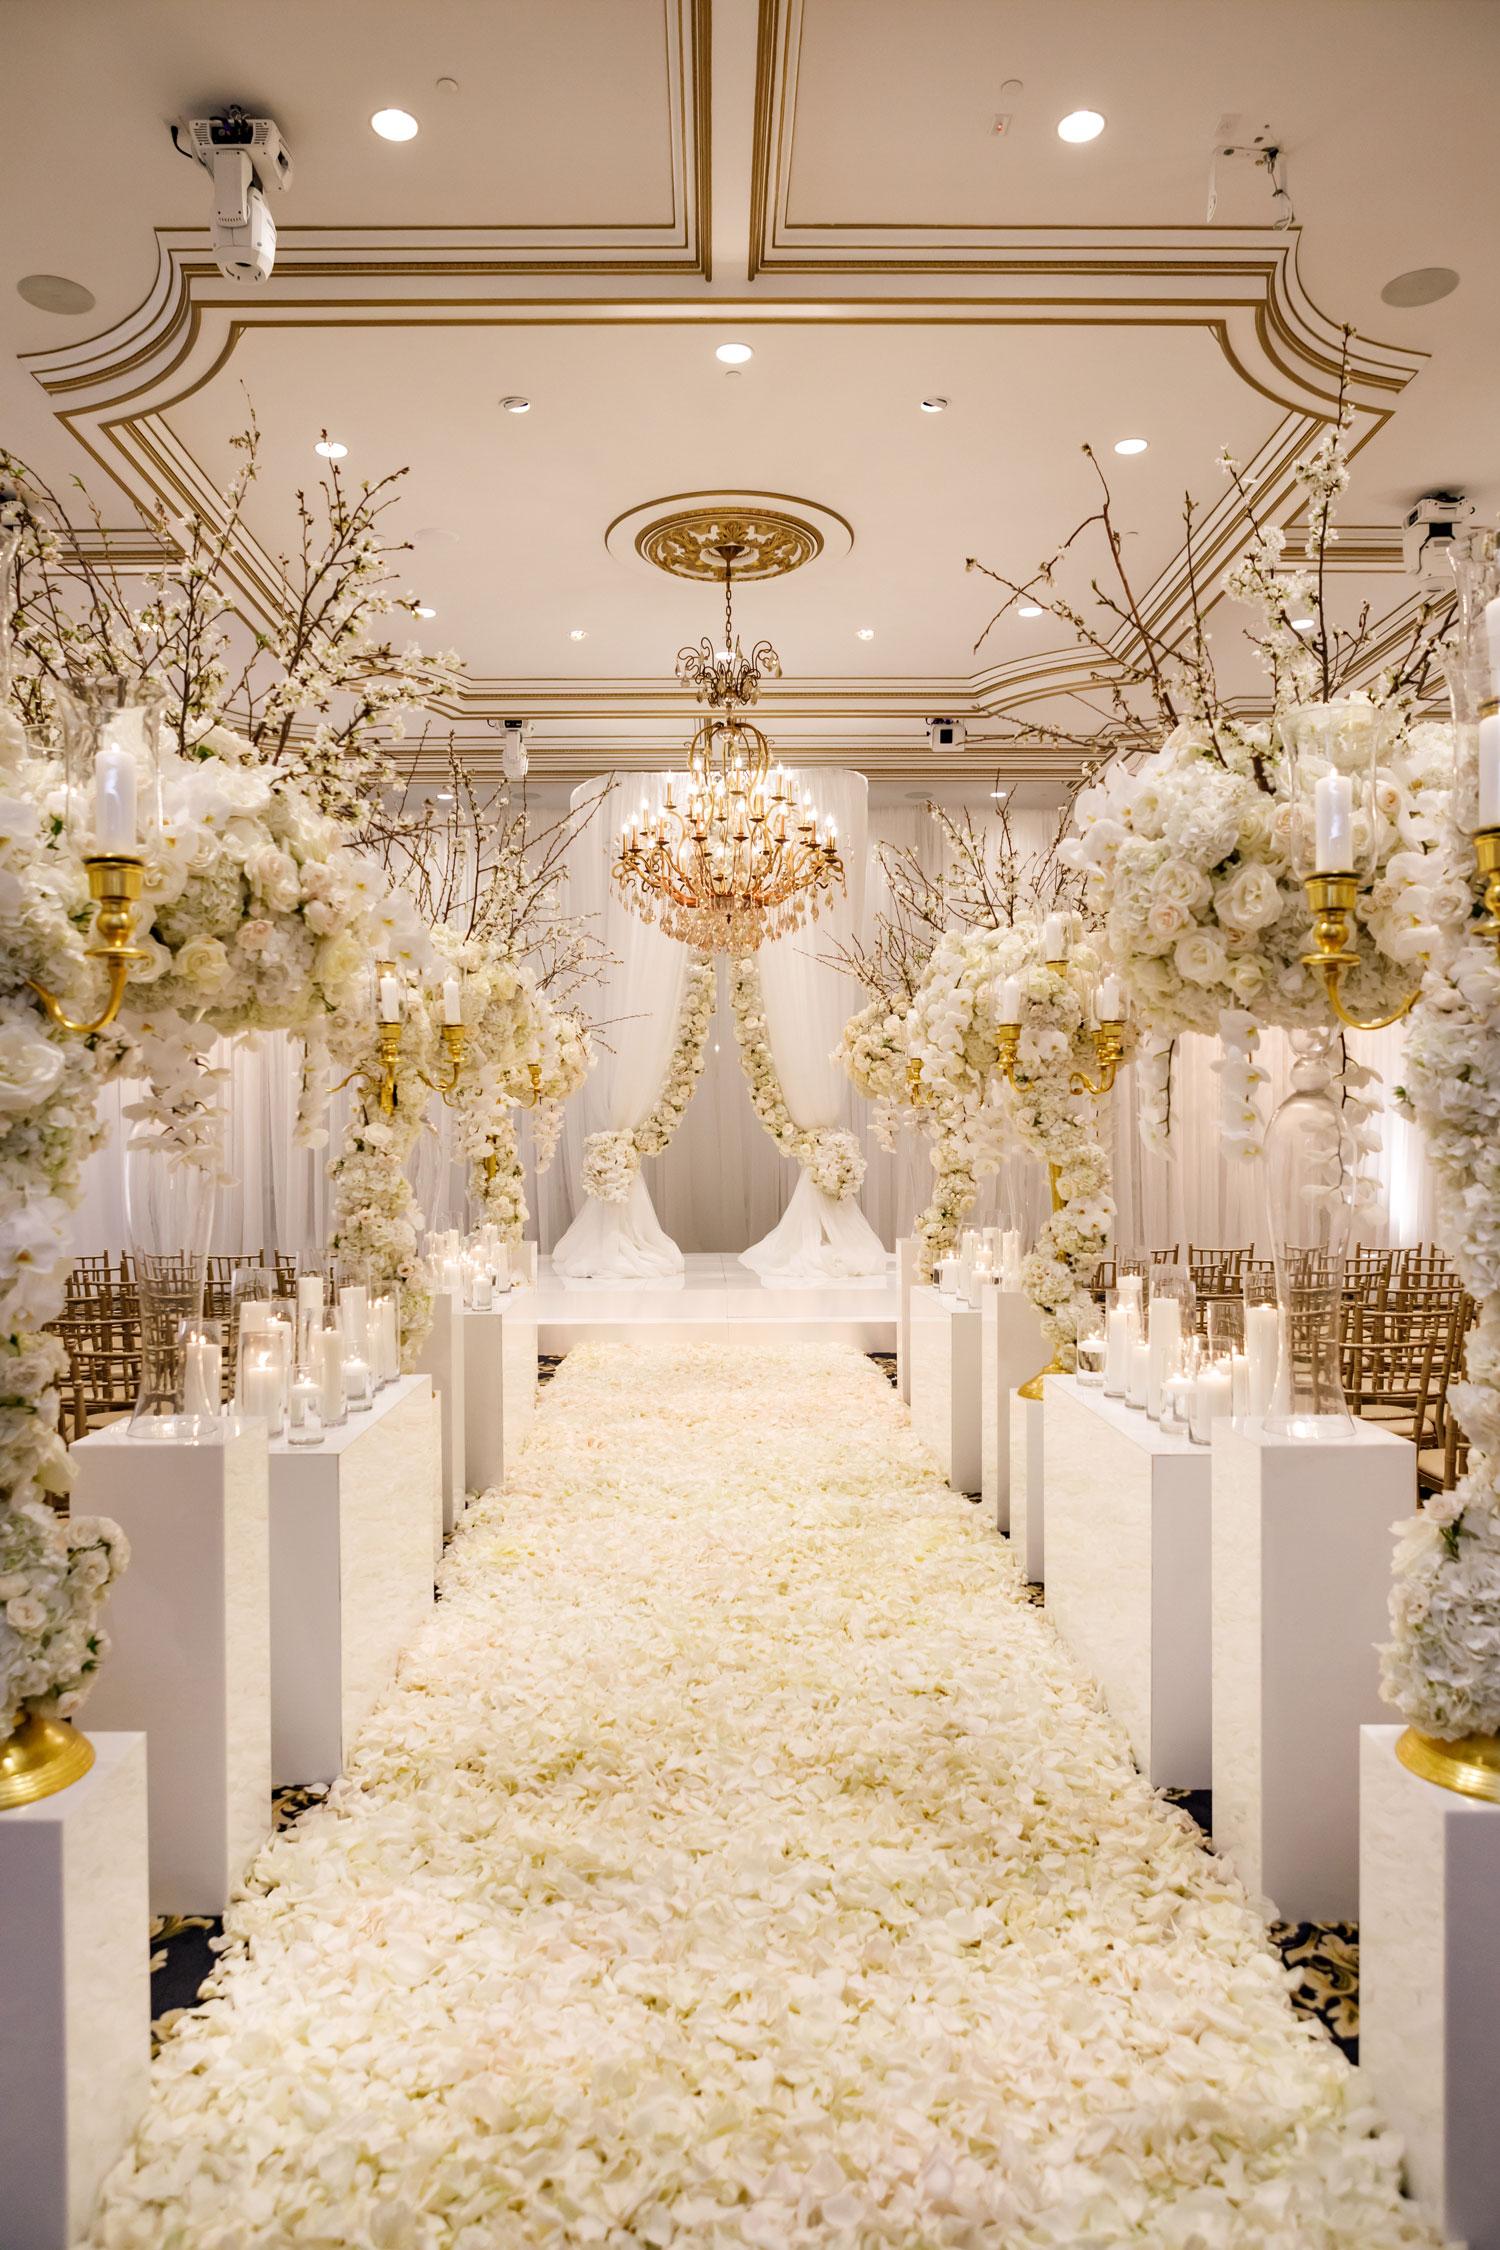 tahir whitehead luxury wedding ceremony castle venue 2019 most popular real weddings